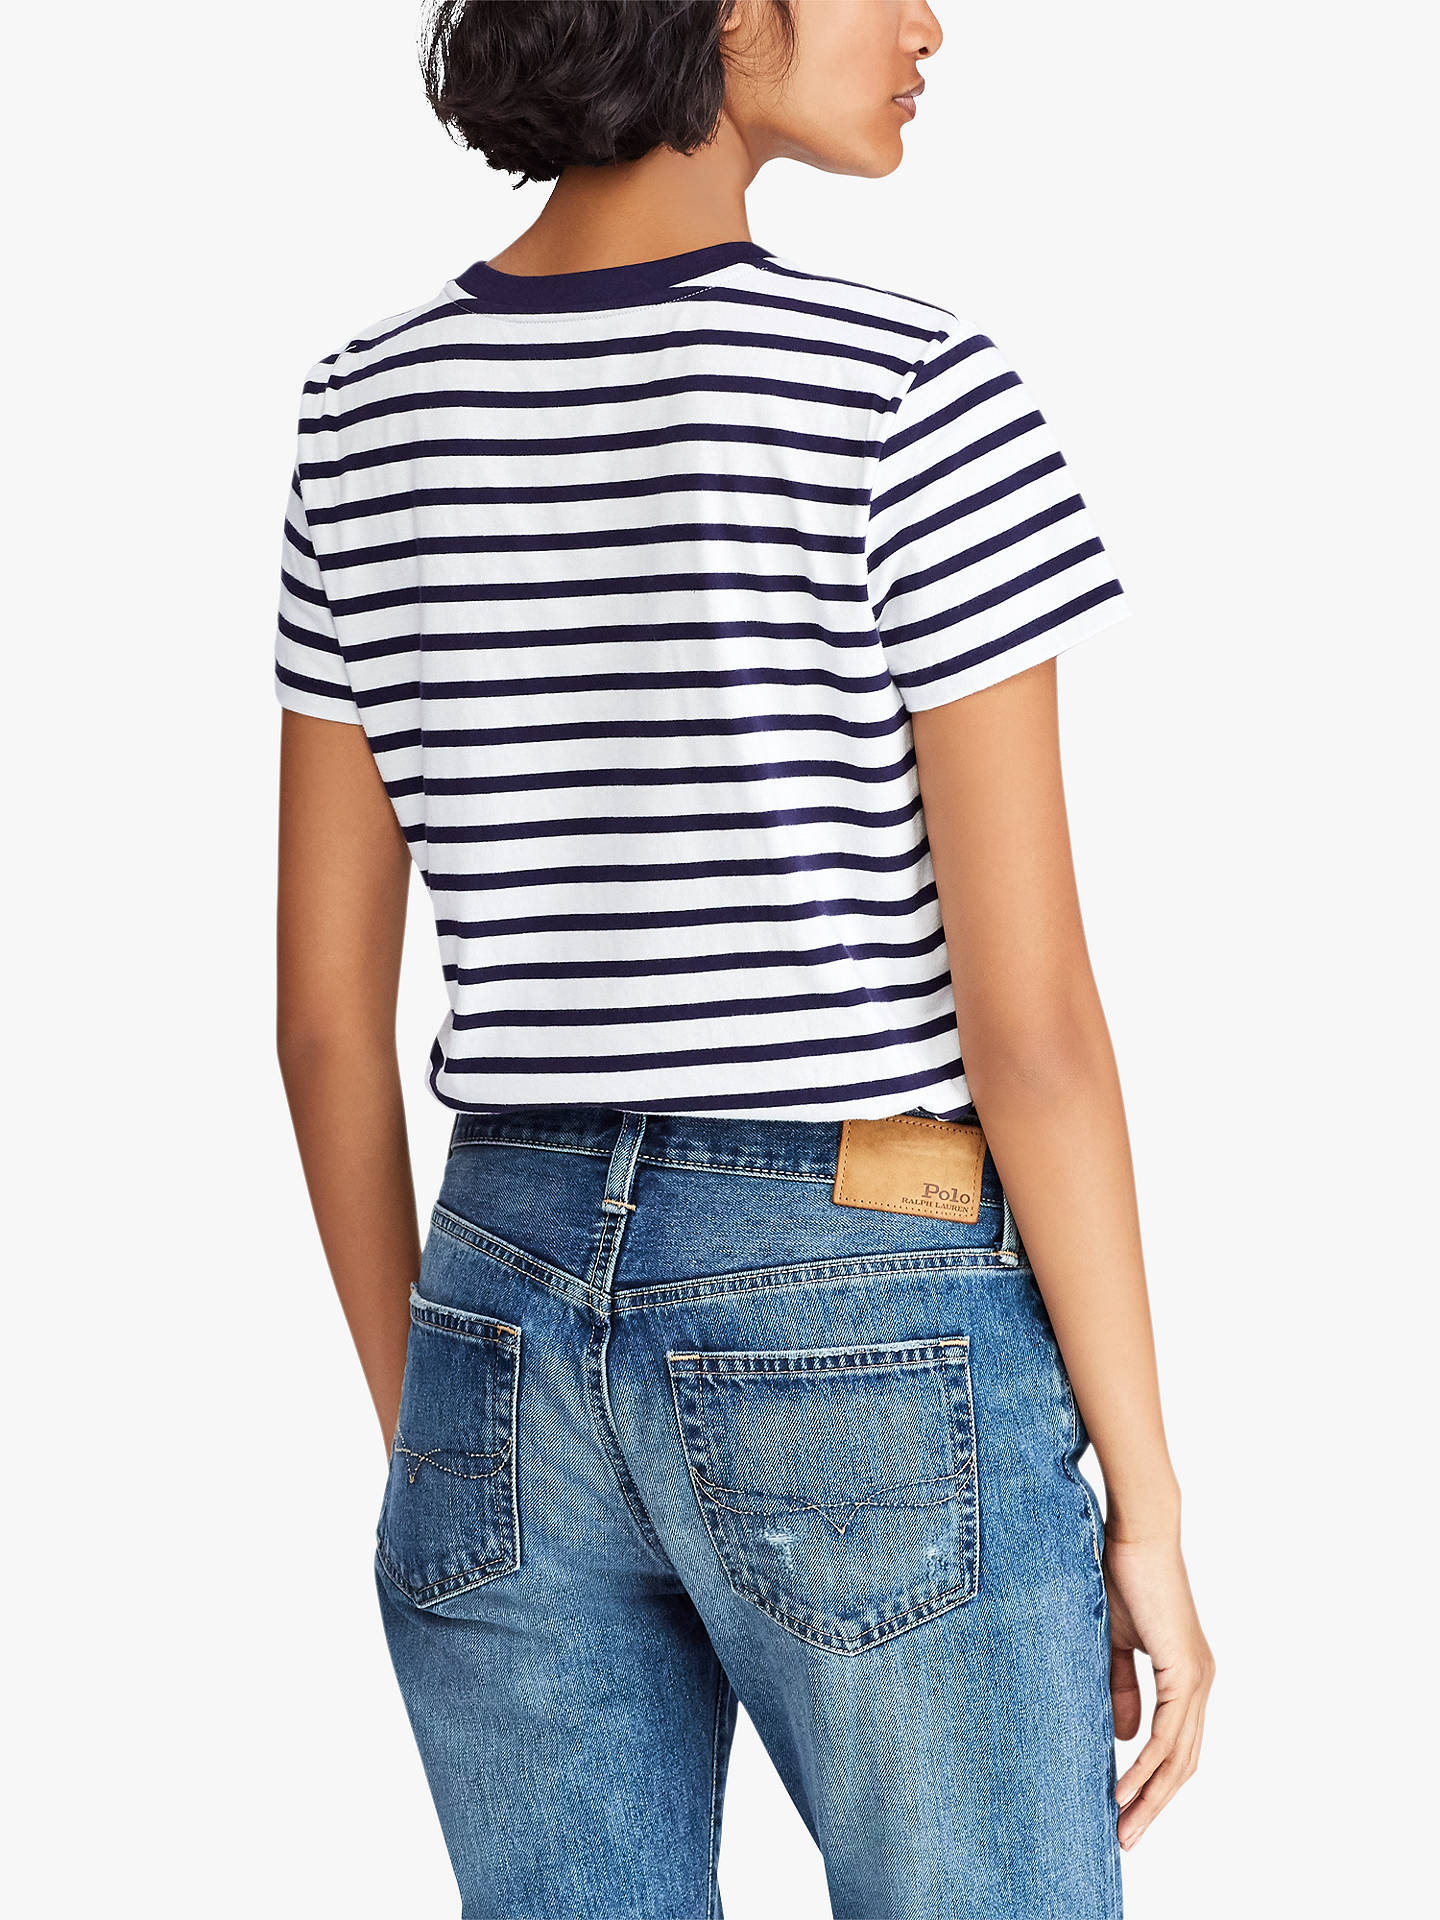 Cotton Lauren ShirtWhitenew Polo Ralph Striped T At Navy Nautical H9eEYWDI2